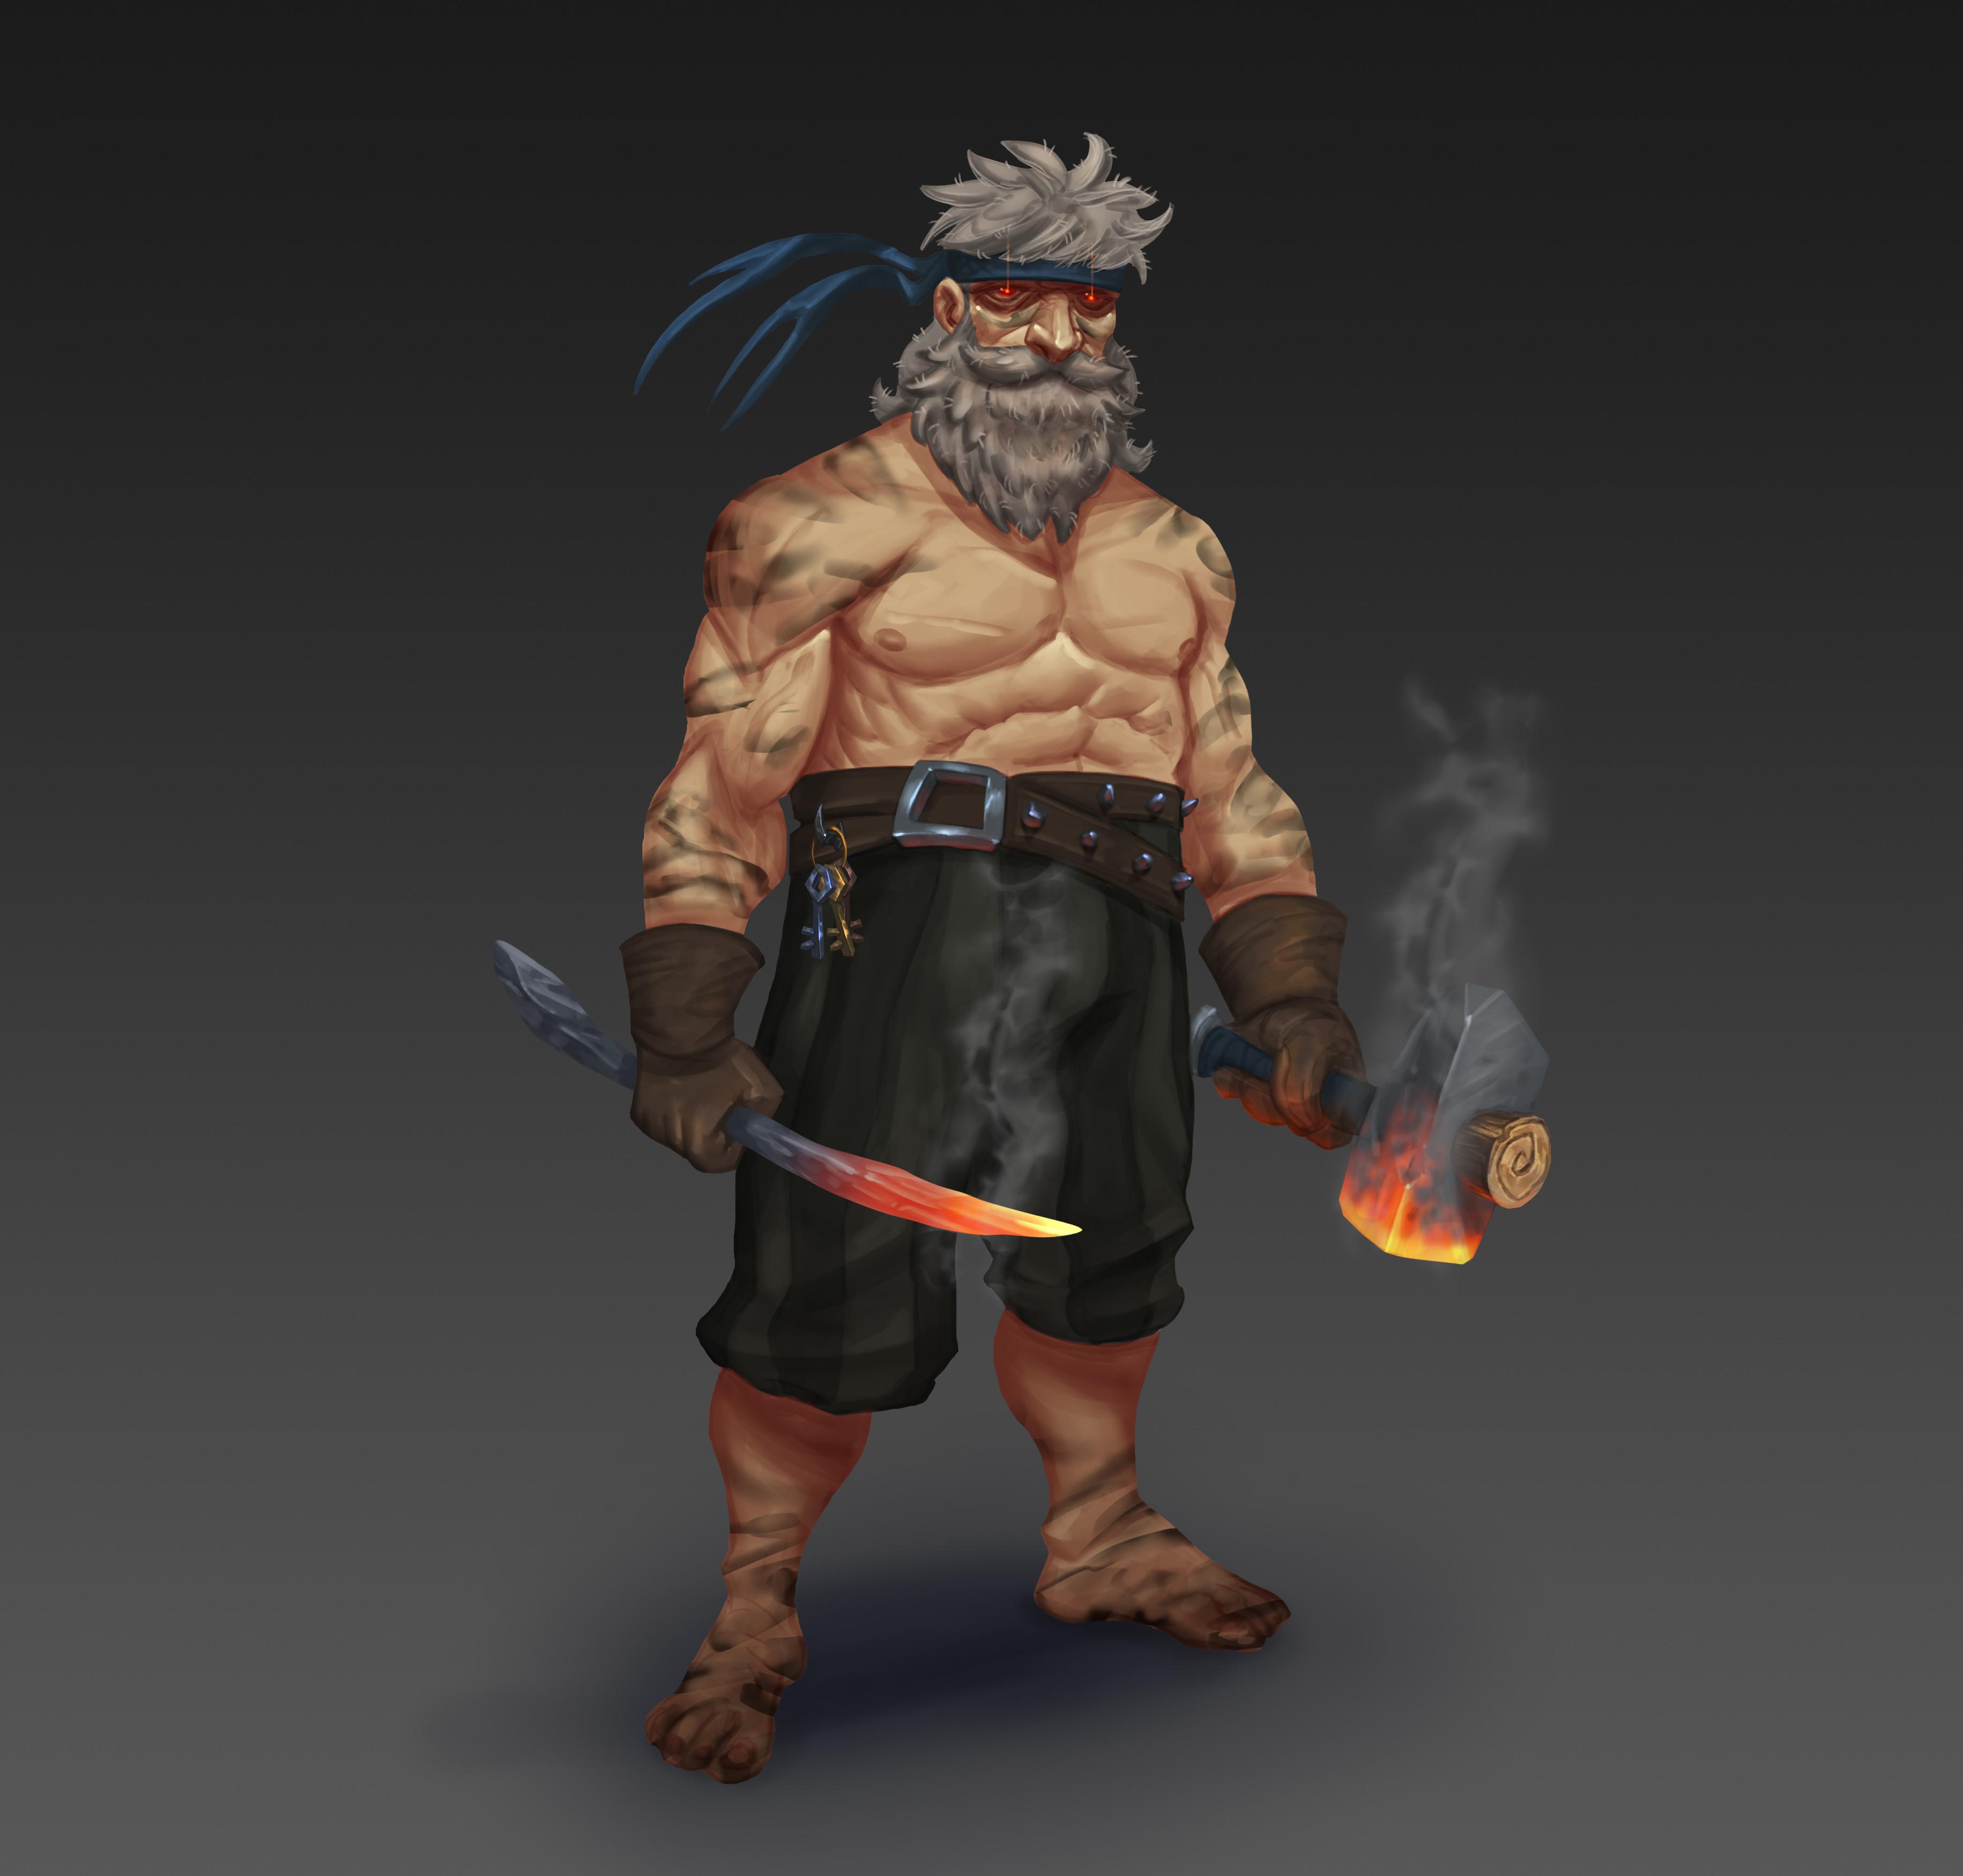 Patxi the Blacksmith